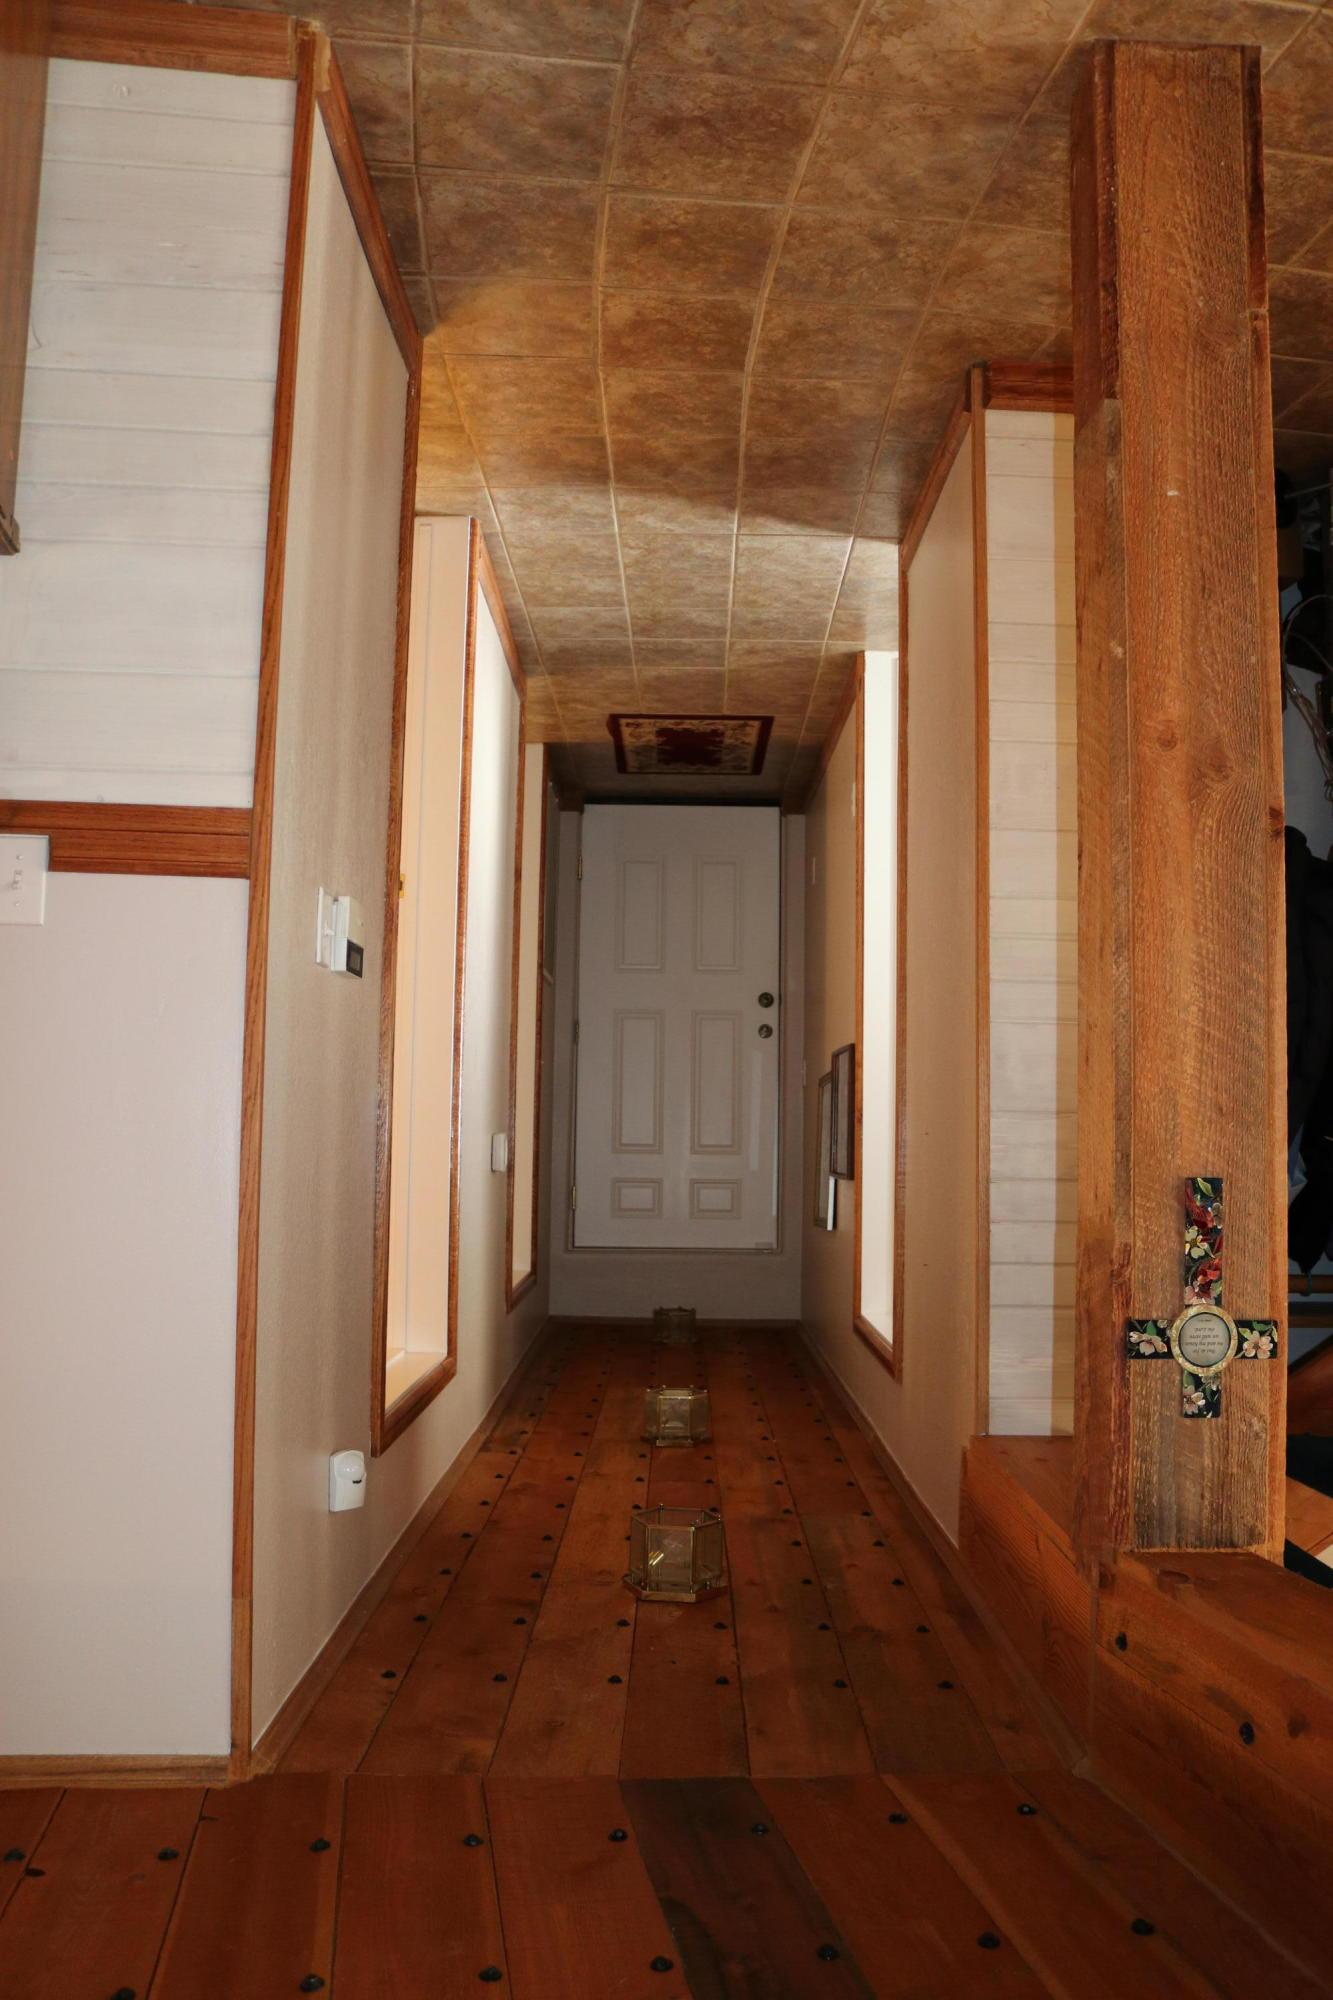 032 Hallway 1